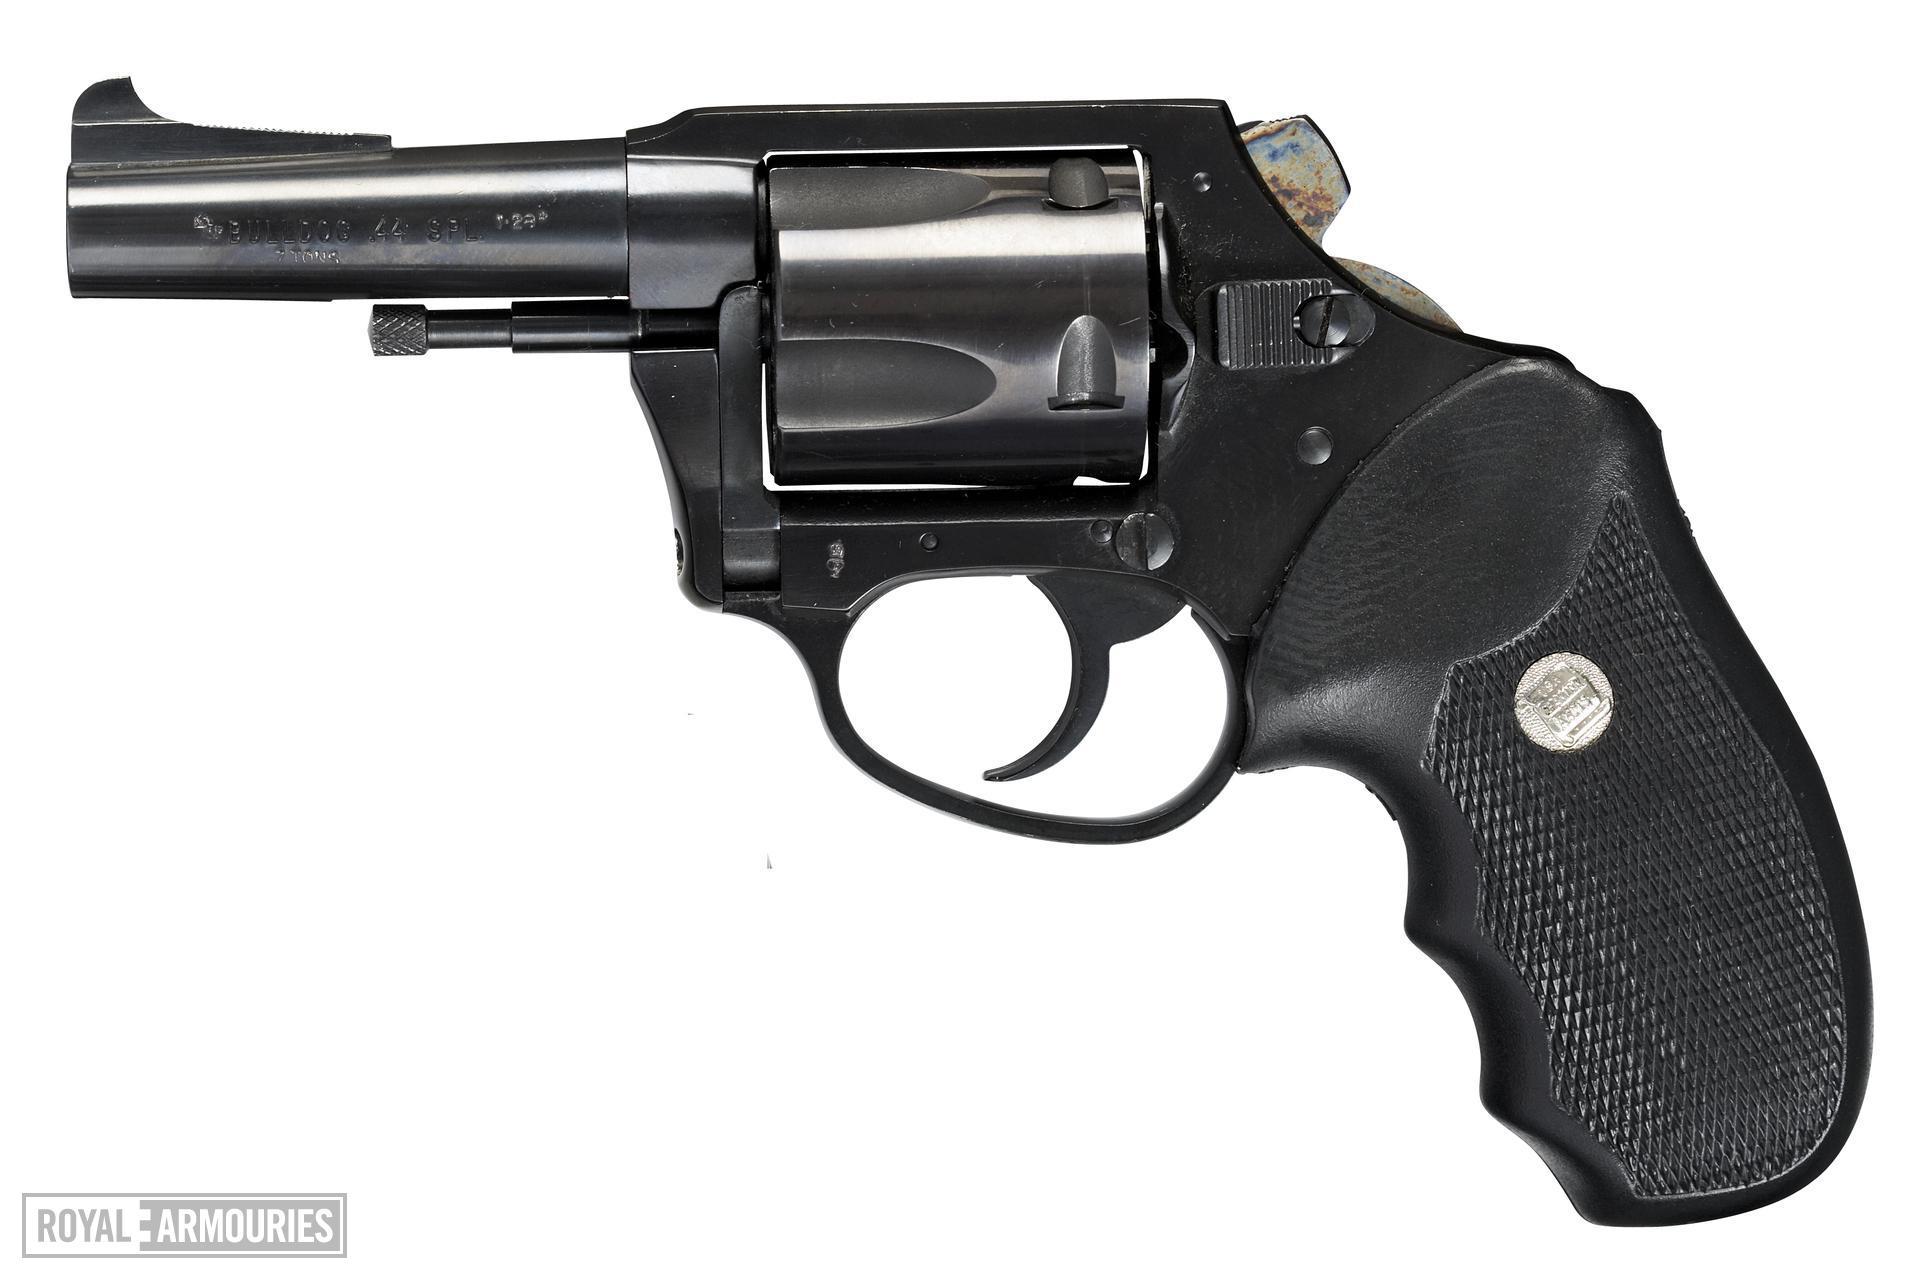 Centrefire five-shot revolver - Charter Arms Bulldog